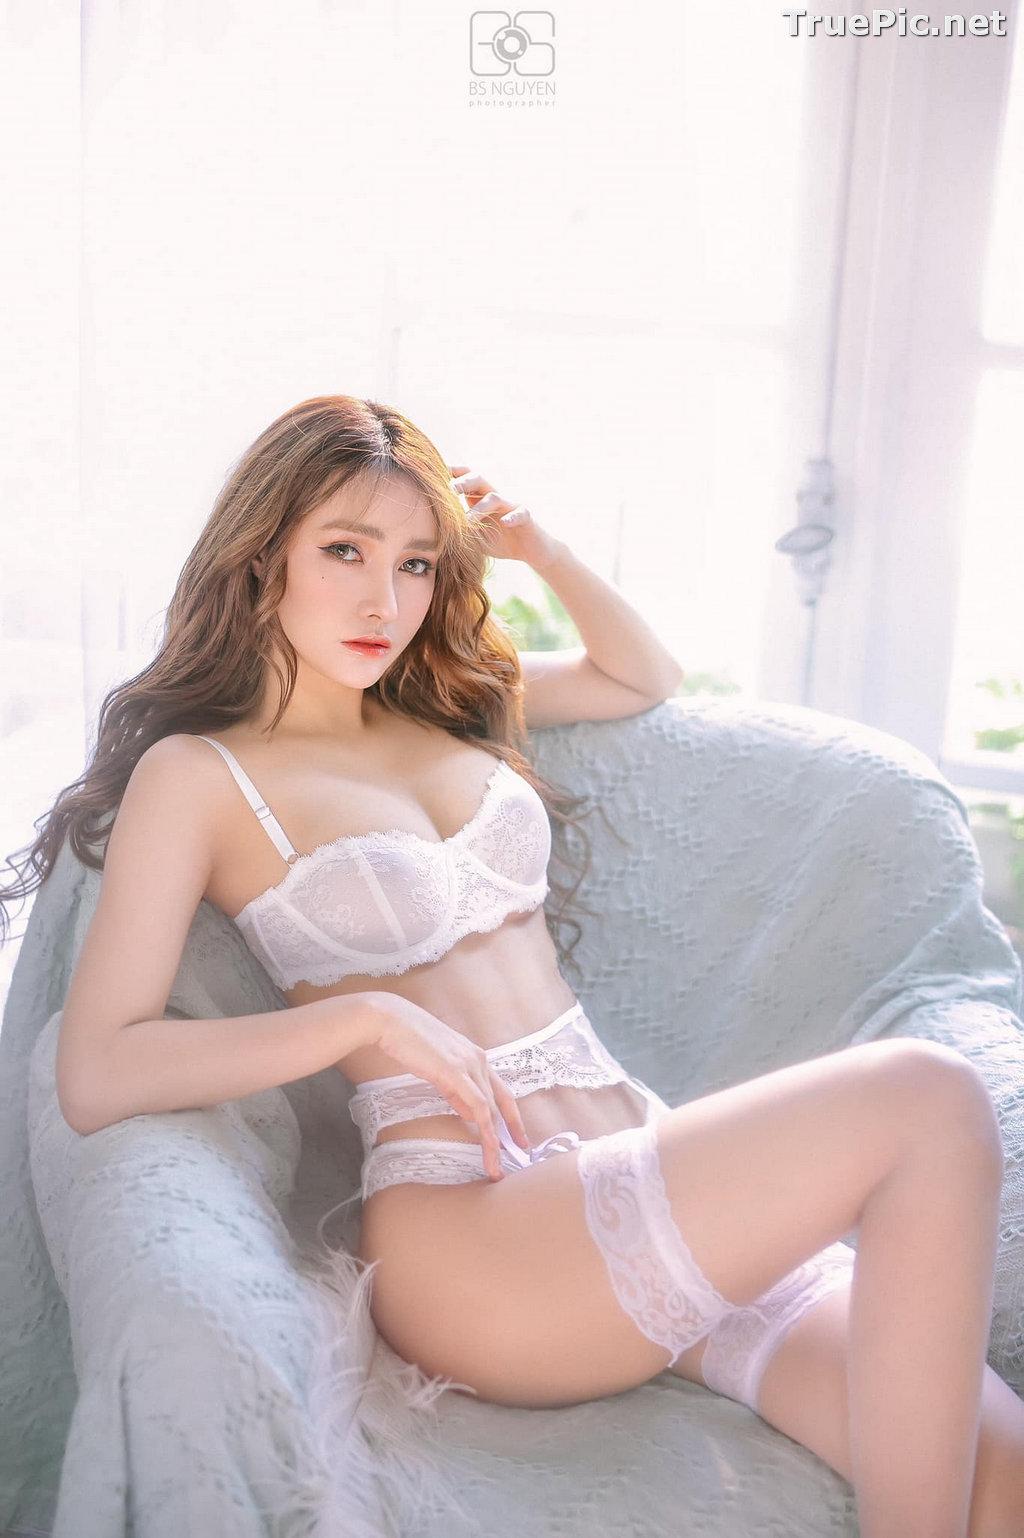 Image Vietnamese Model - Nguyen Thi Phi Yen - Beautiful Sexy White Lingerie - TruePic.net - Picture-24